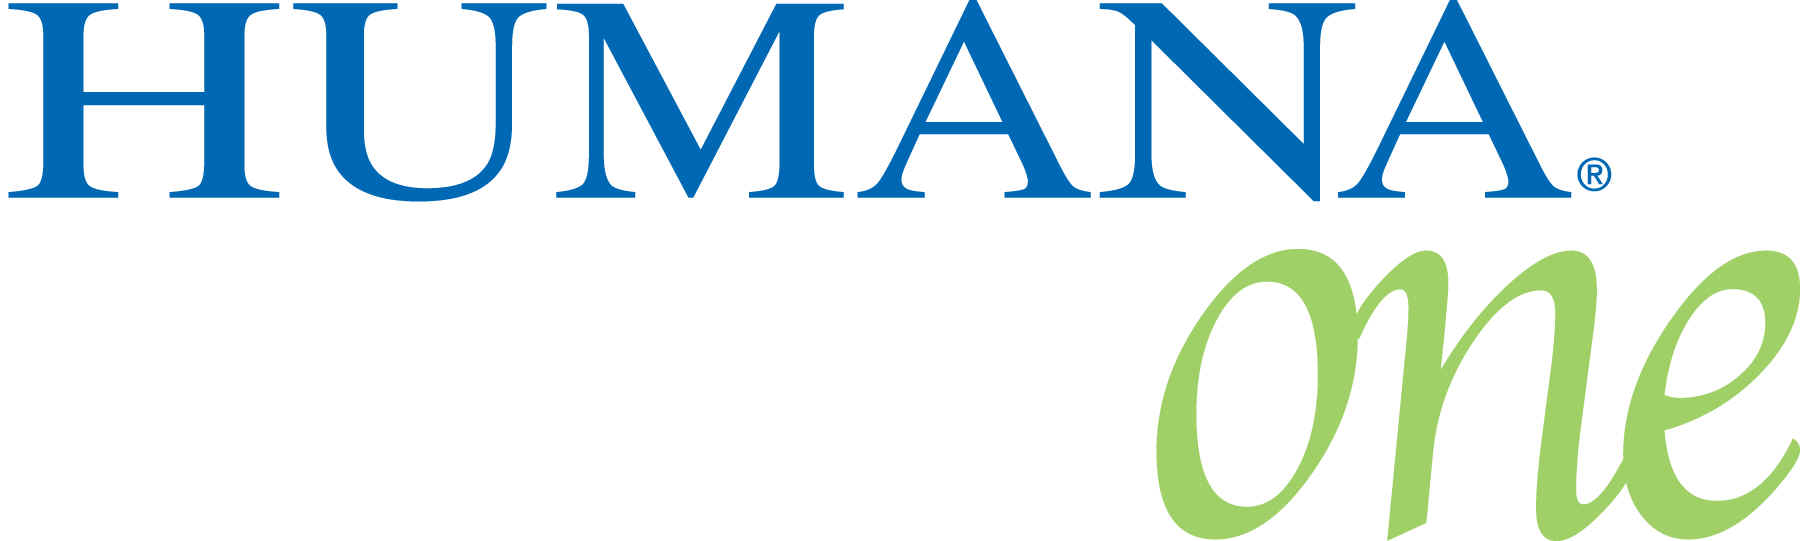 Get Humana Dental Insurance Online - QuoteFinder.Org